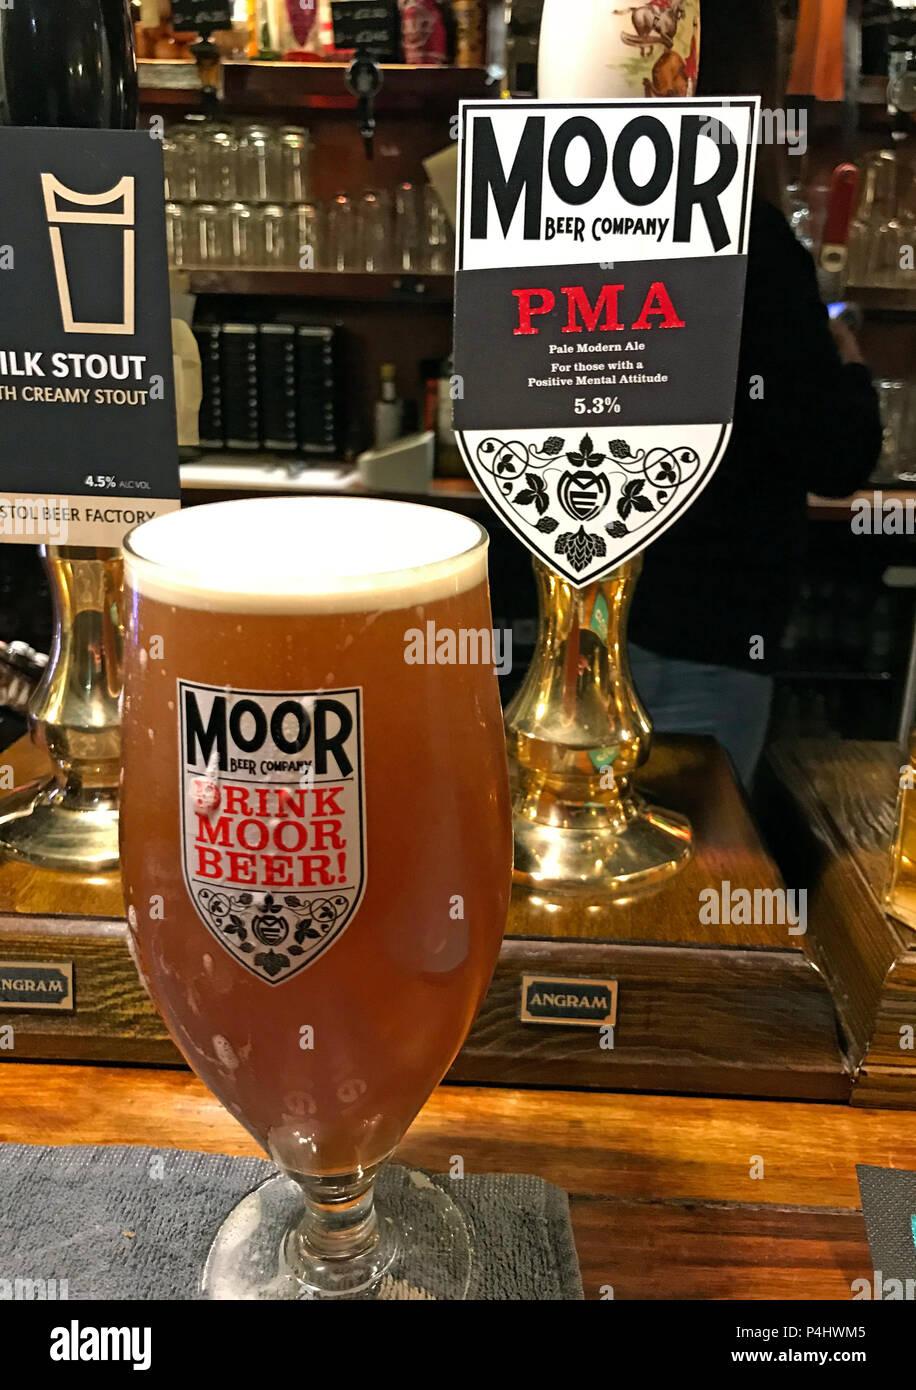 Moor Beer Company,PMA,Drink Moor Beer,Drink more beer,bar pump,handpull,Somerset,England,UK,Pale Modern Ale Stock Photo